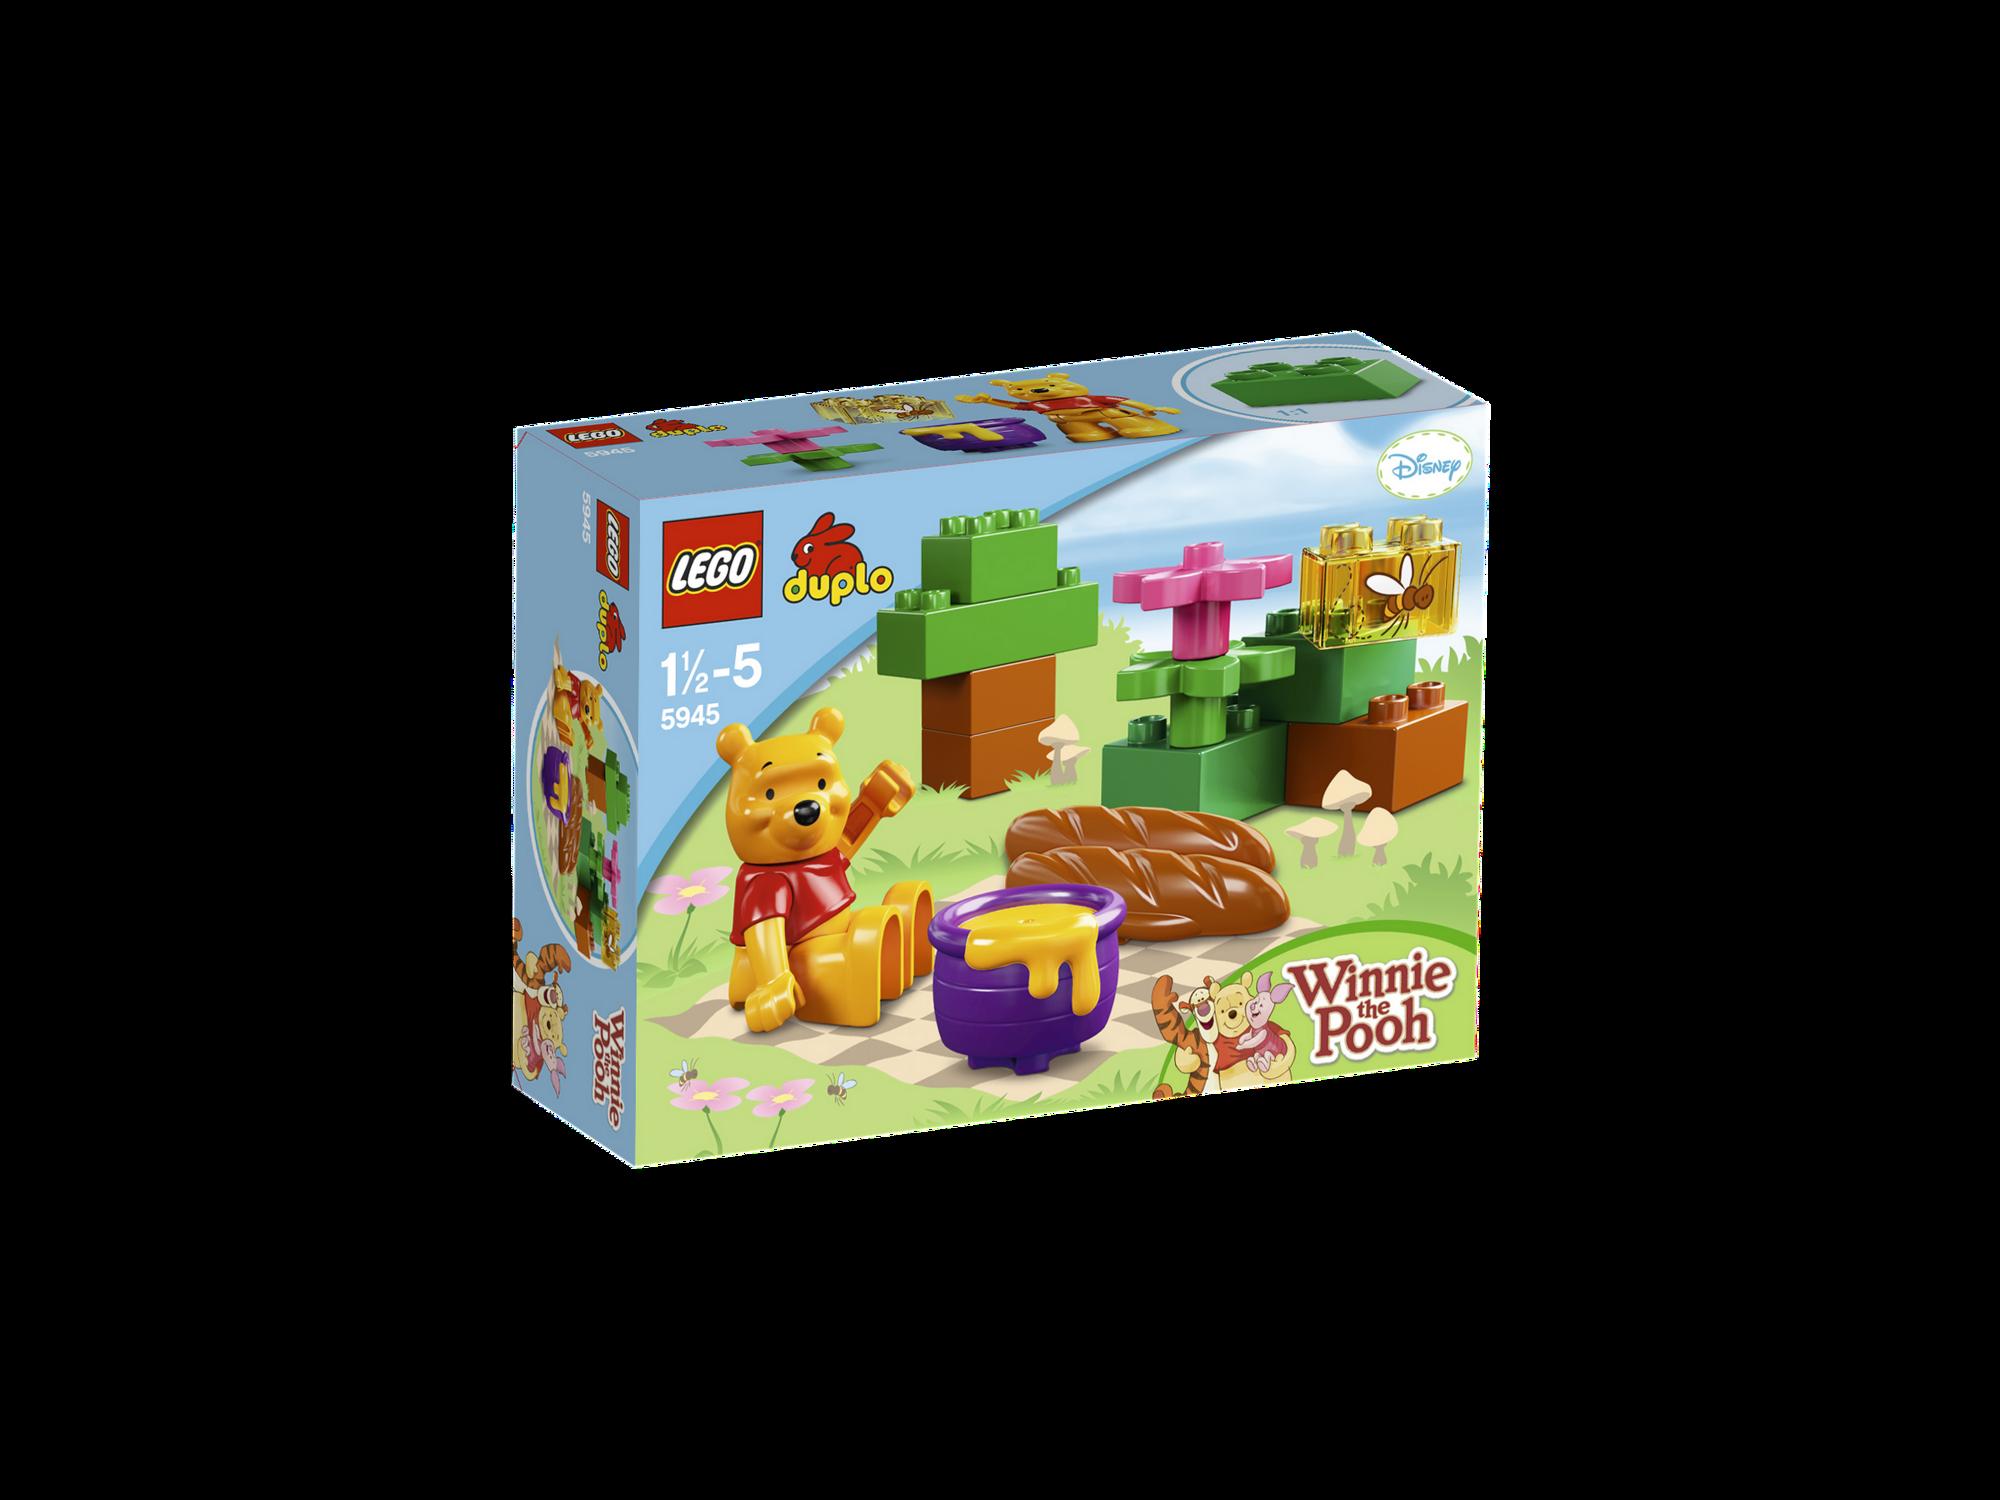 5945 Winnie The Poohs Picnic Brickipedia Fandom Powered By Wikia Lego 5682 Duplo Fire Truck